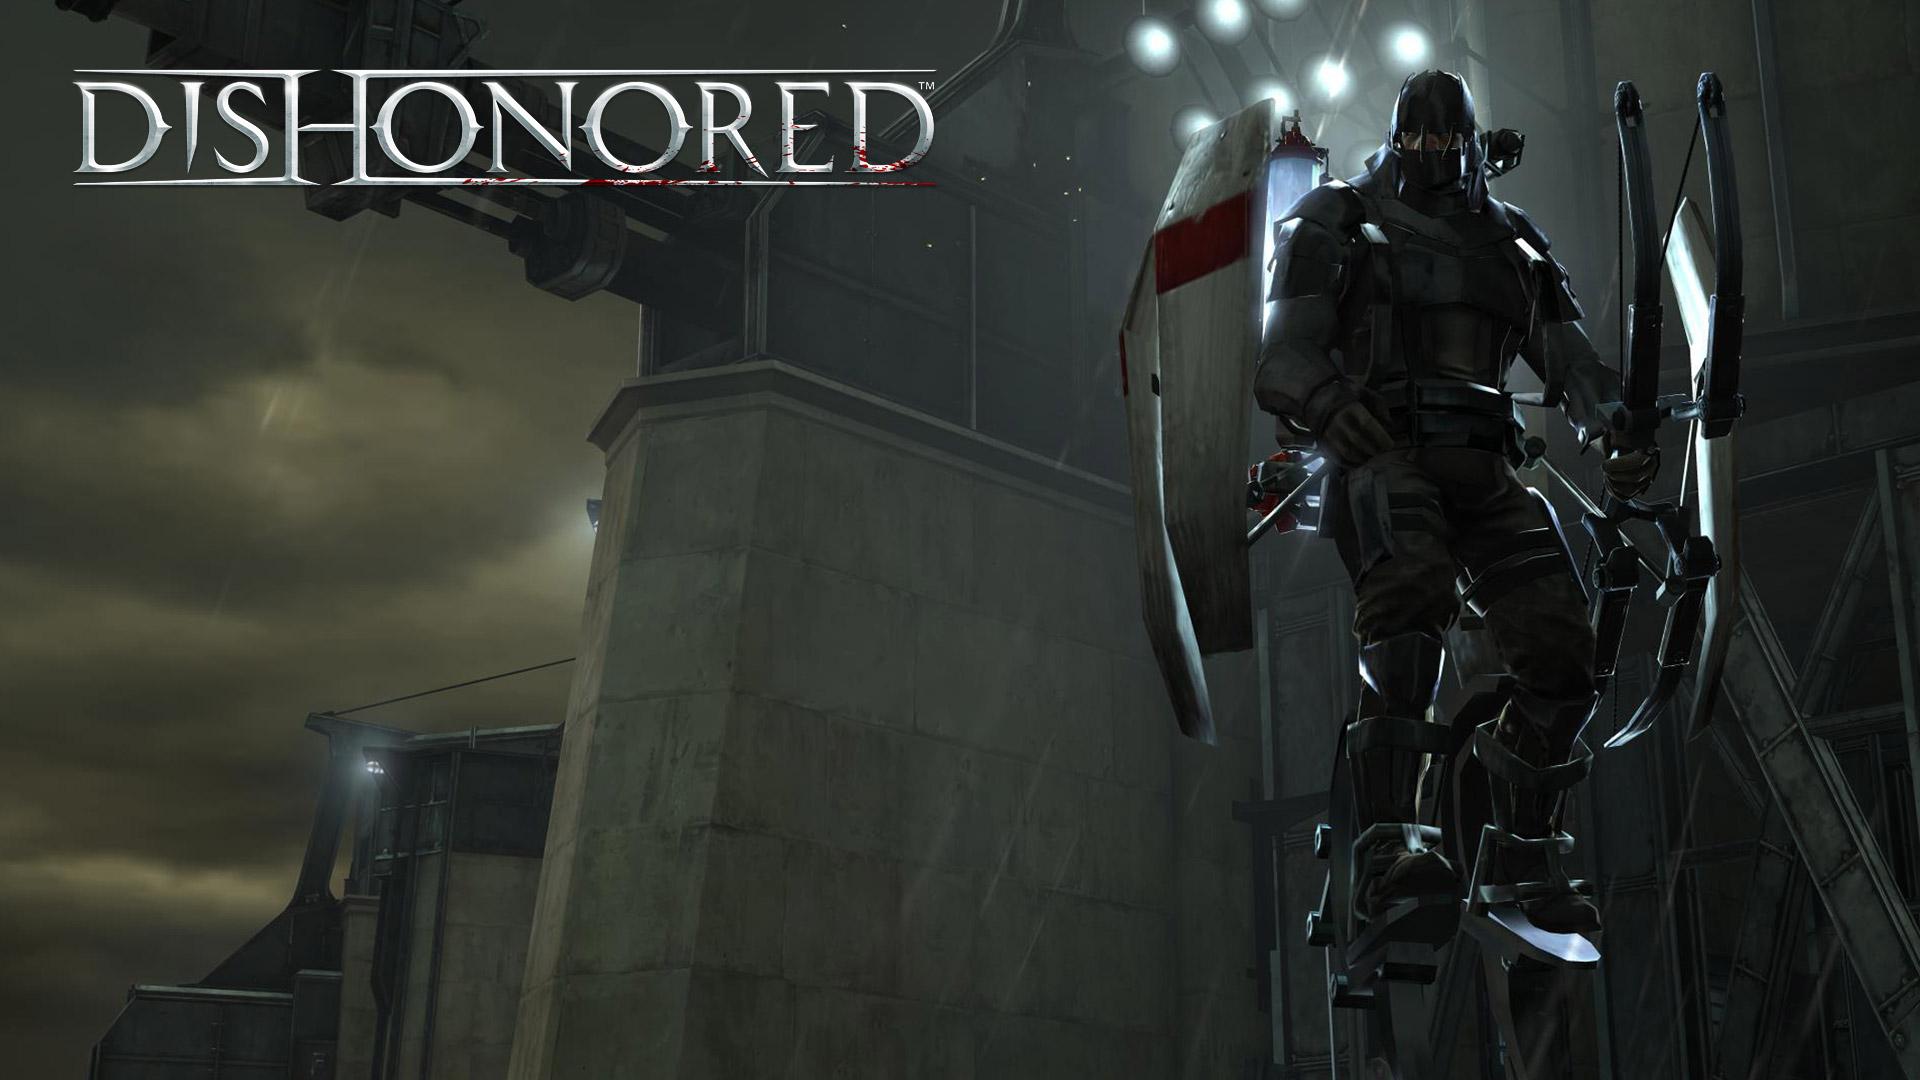 dishonored wallpaper 9 | wallpapersbq